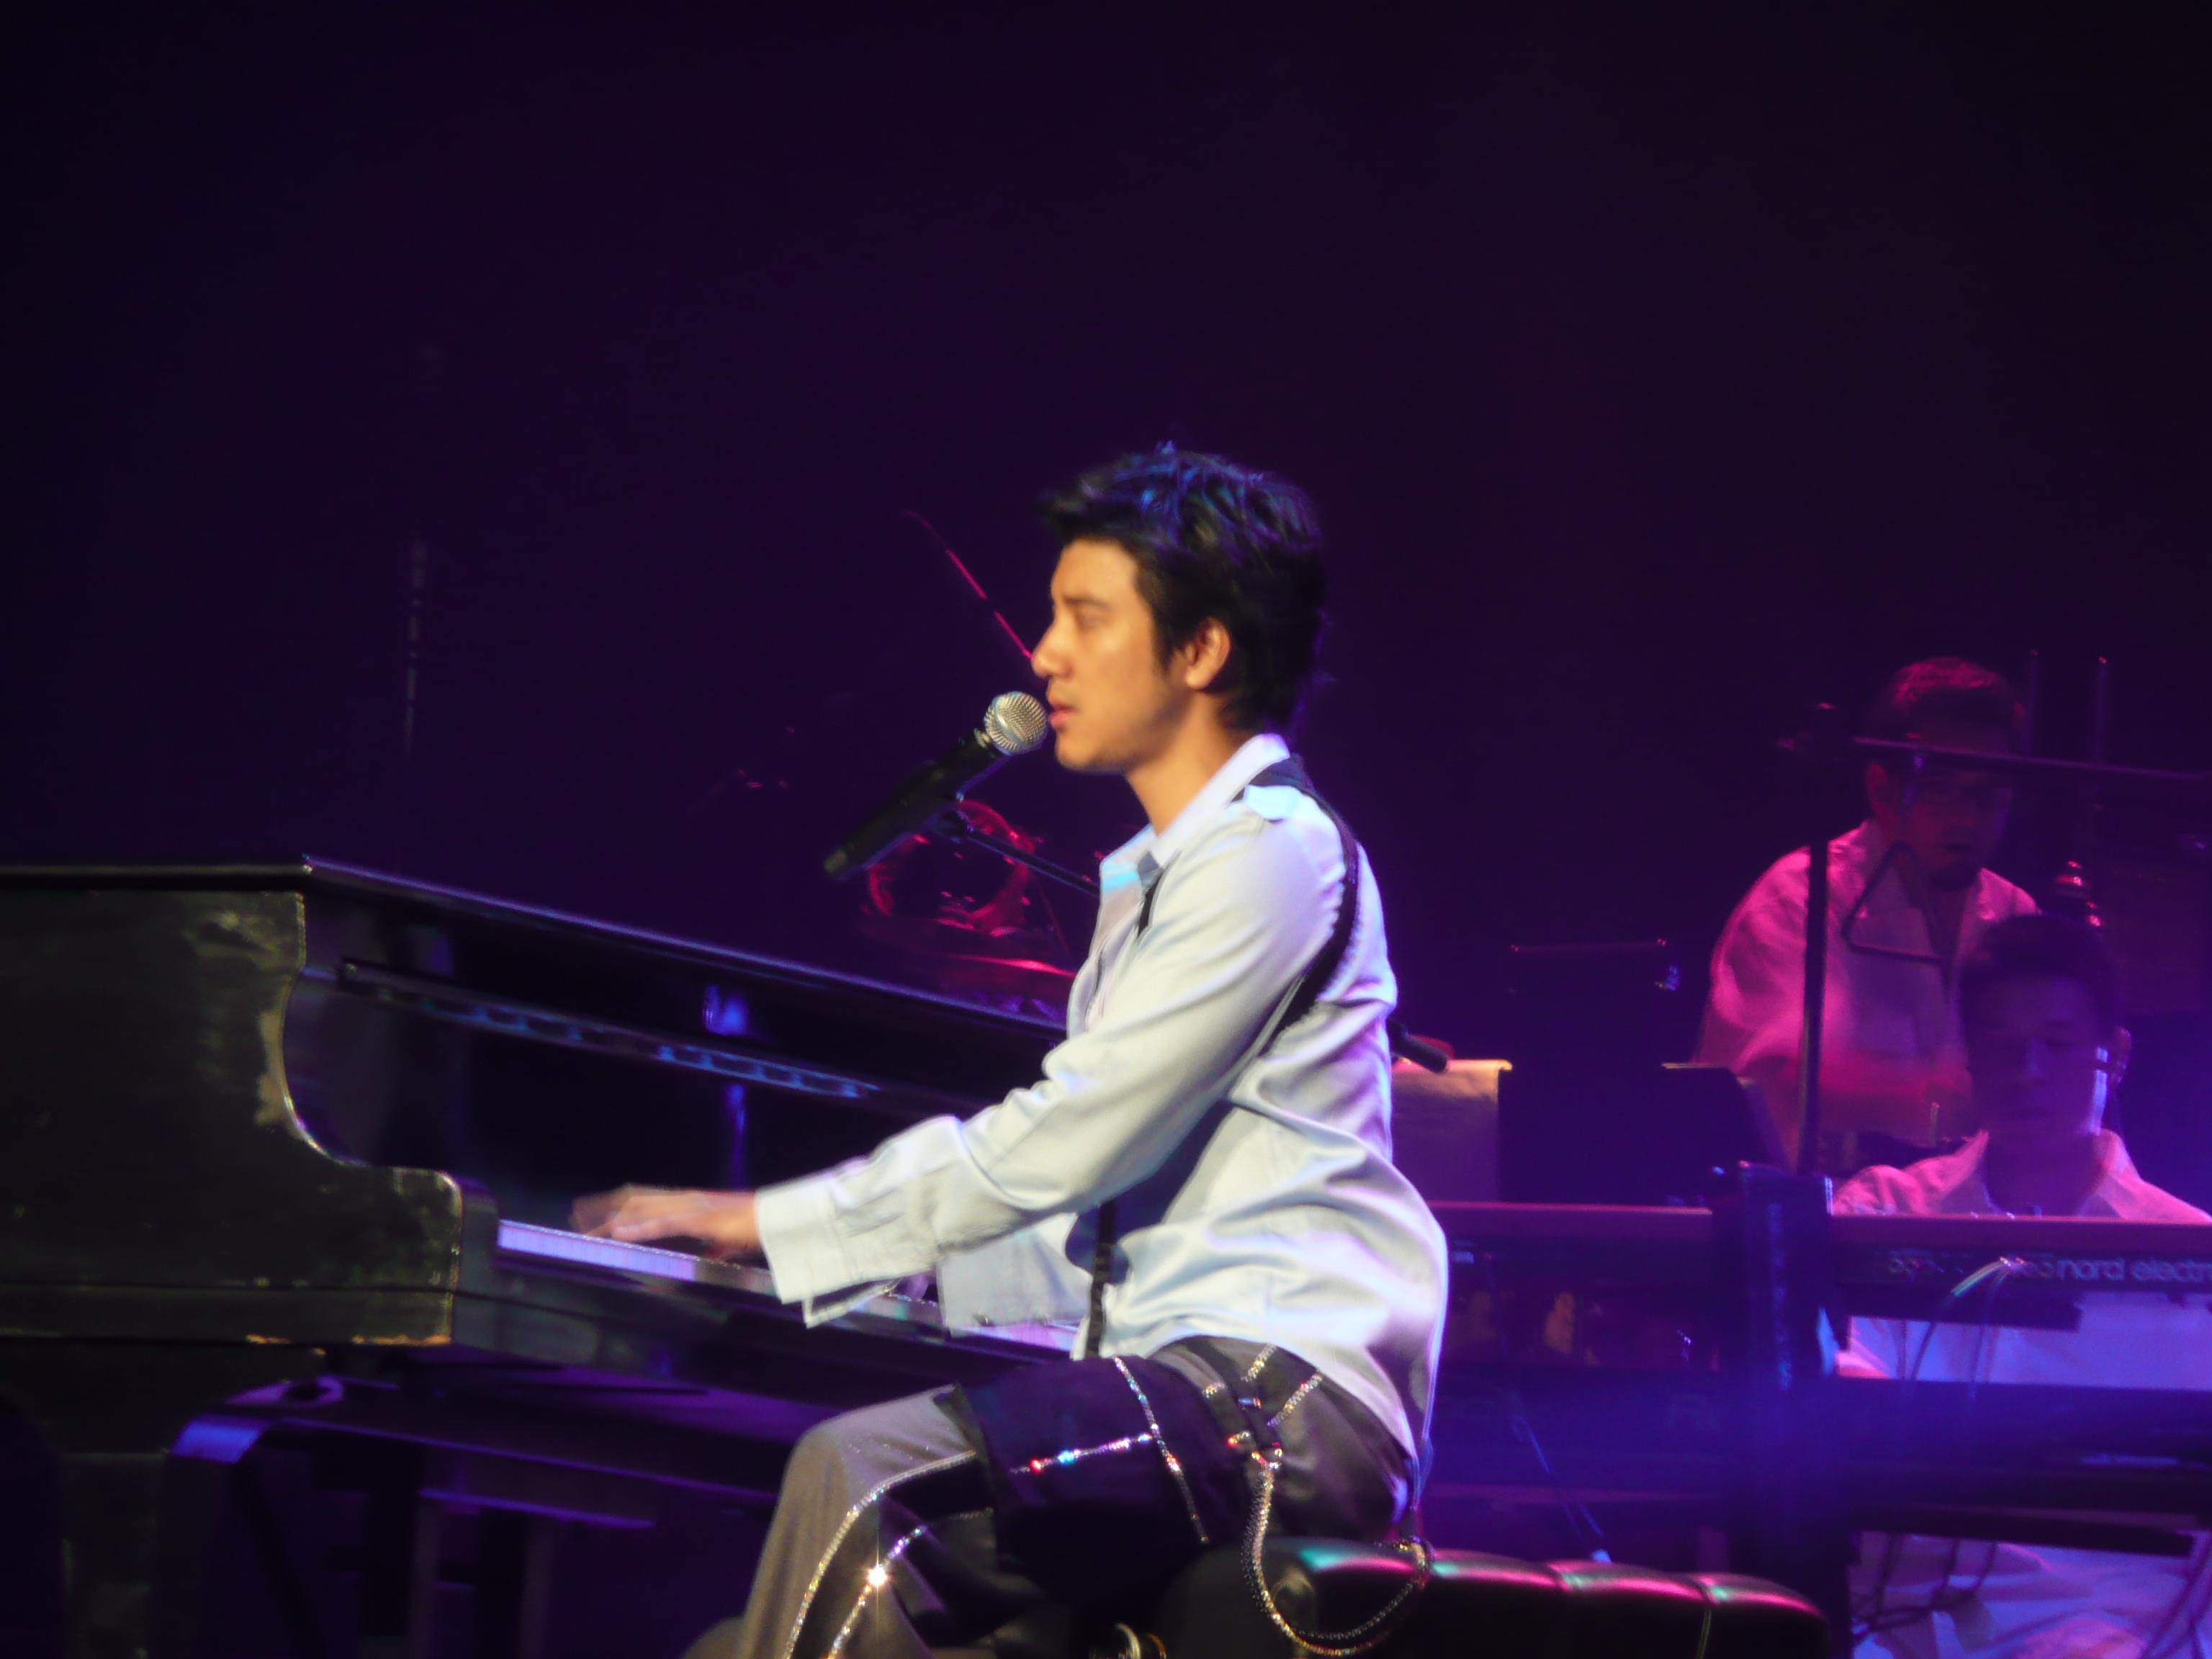 File:Leehom xmas concert at piano.jpg - Wikimedia Commons